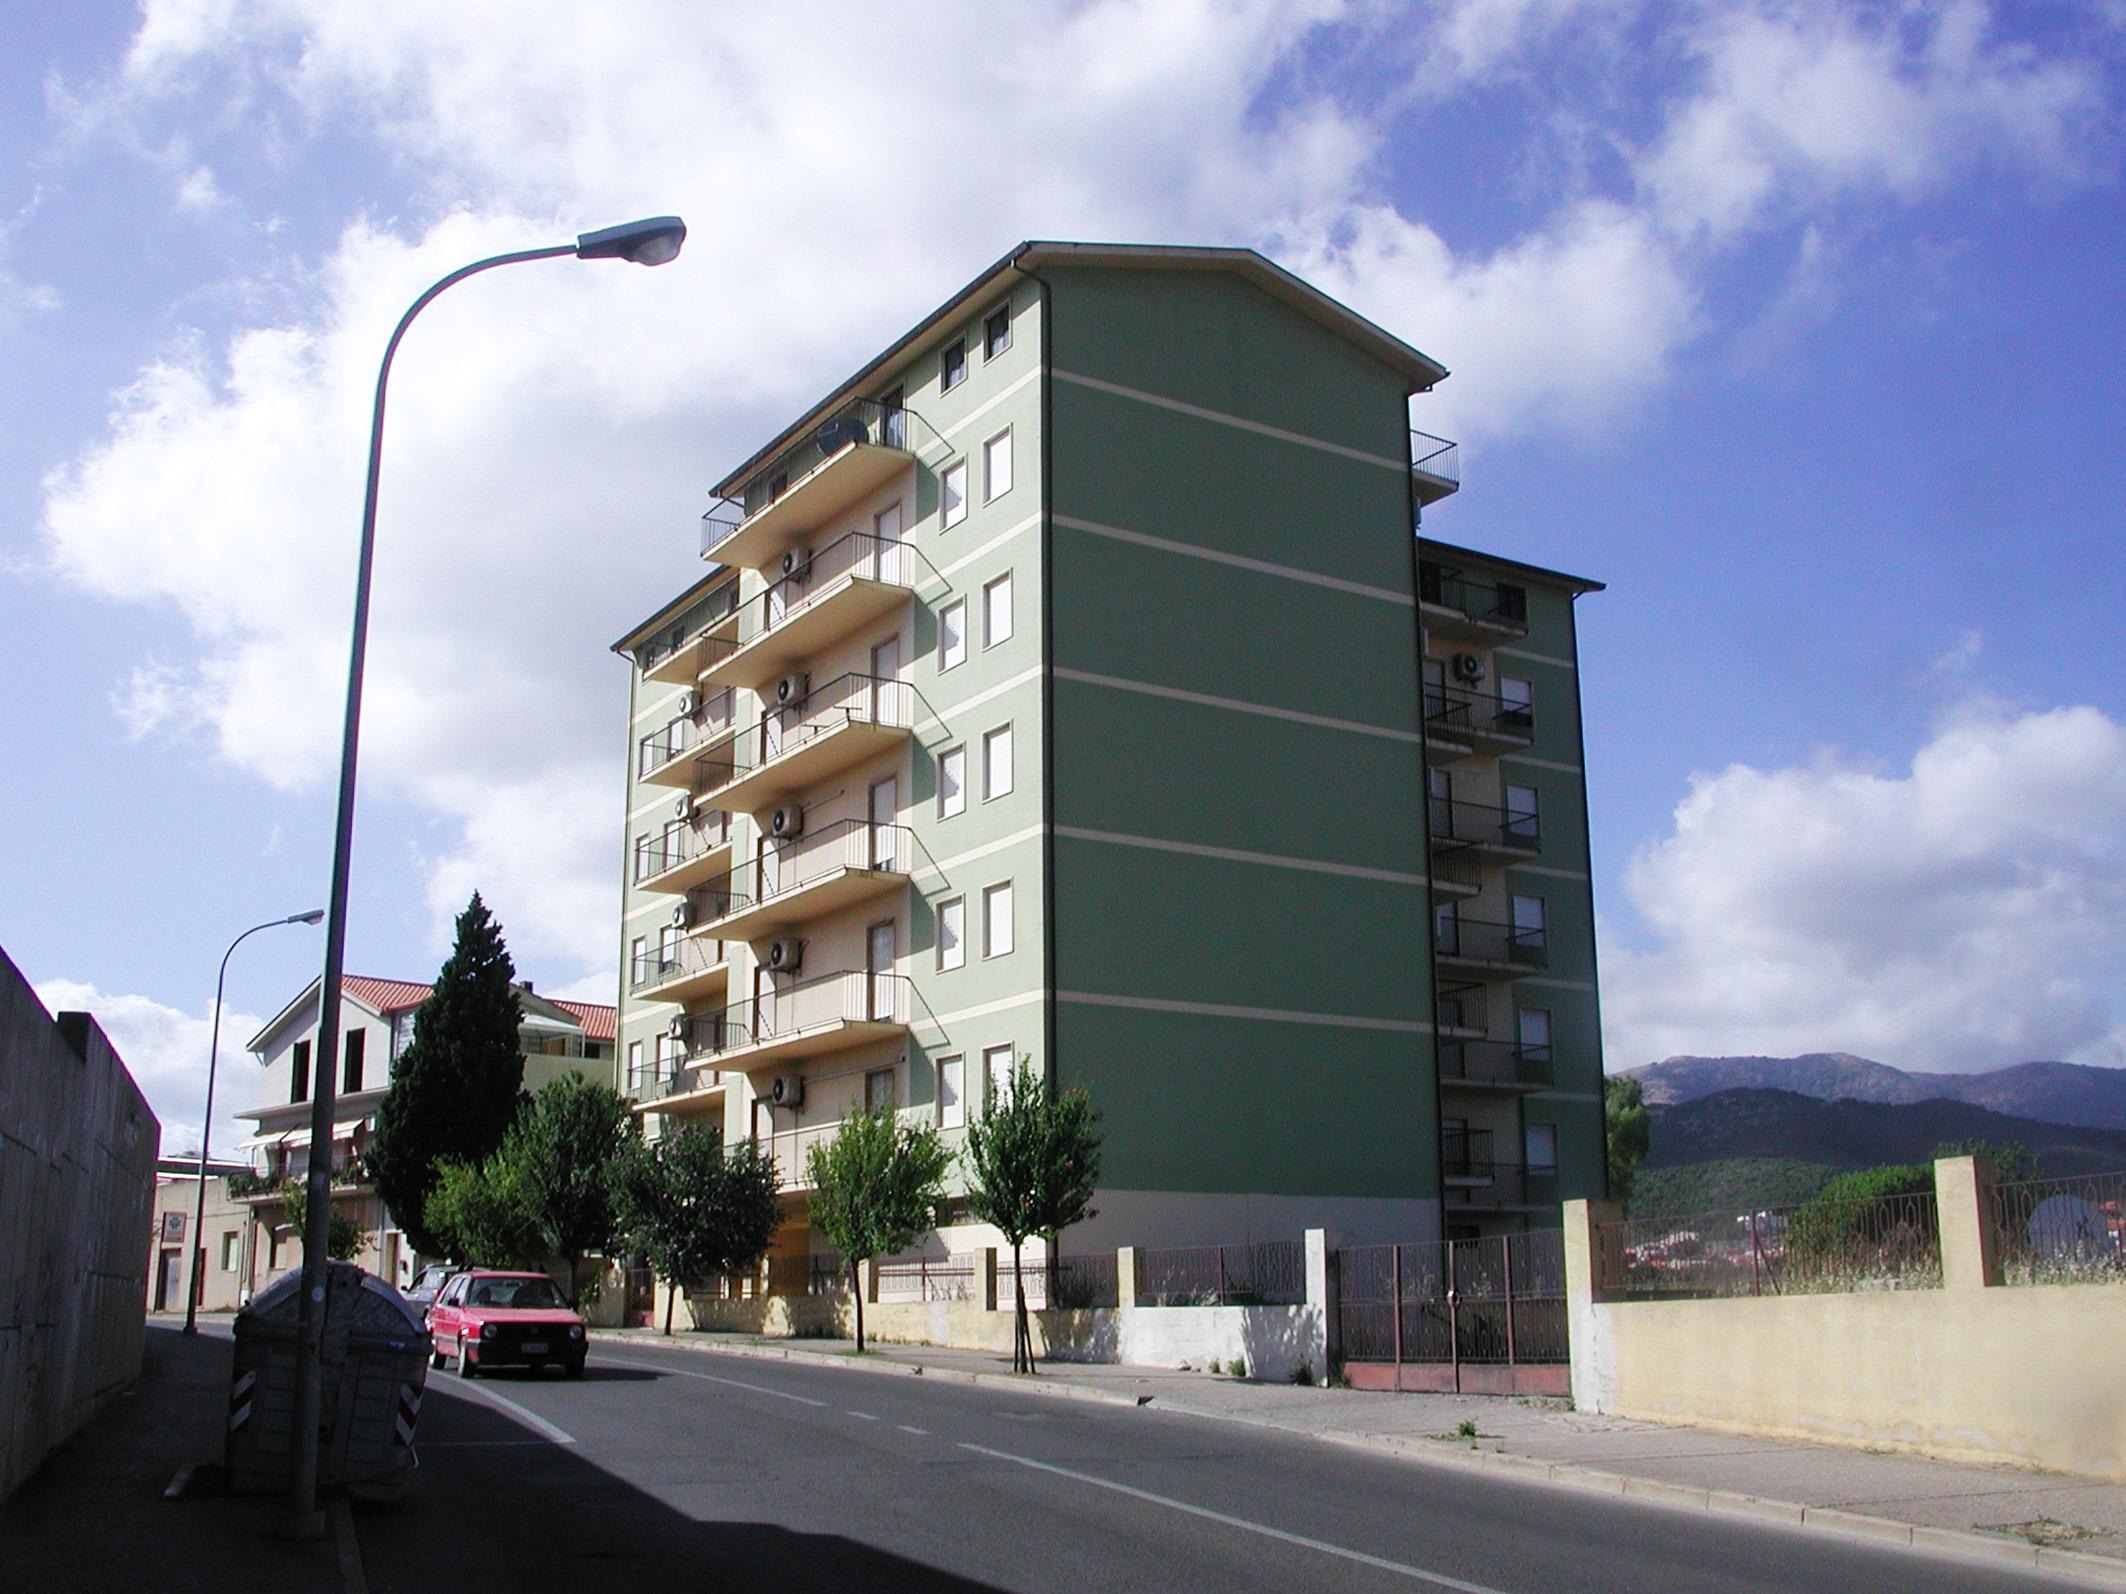 La sede Inps di Iglesias